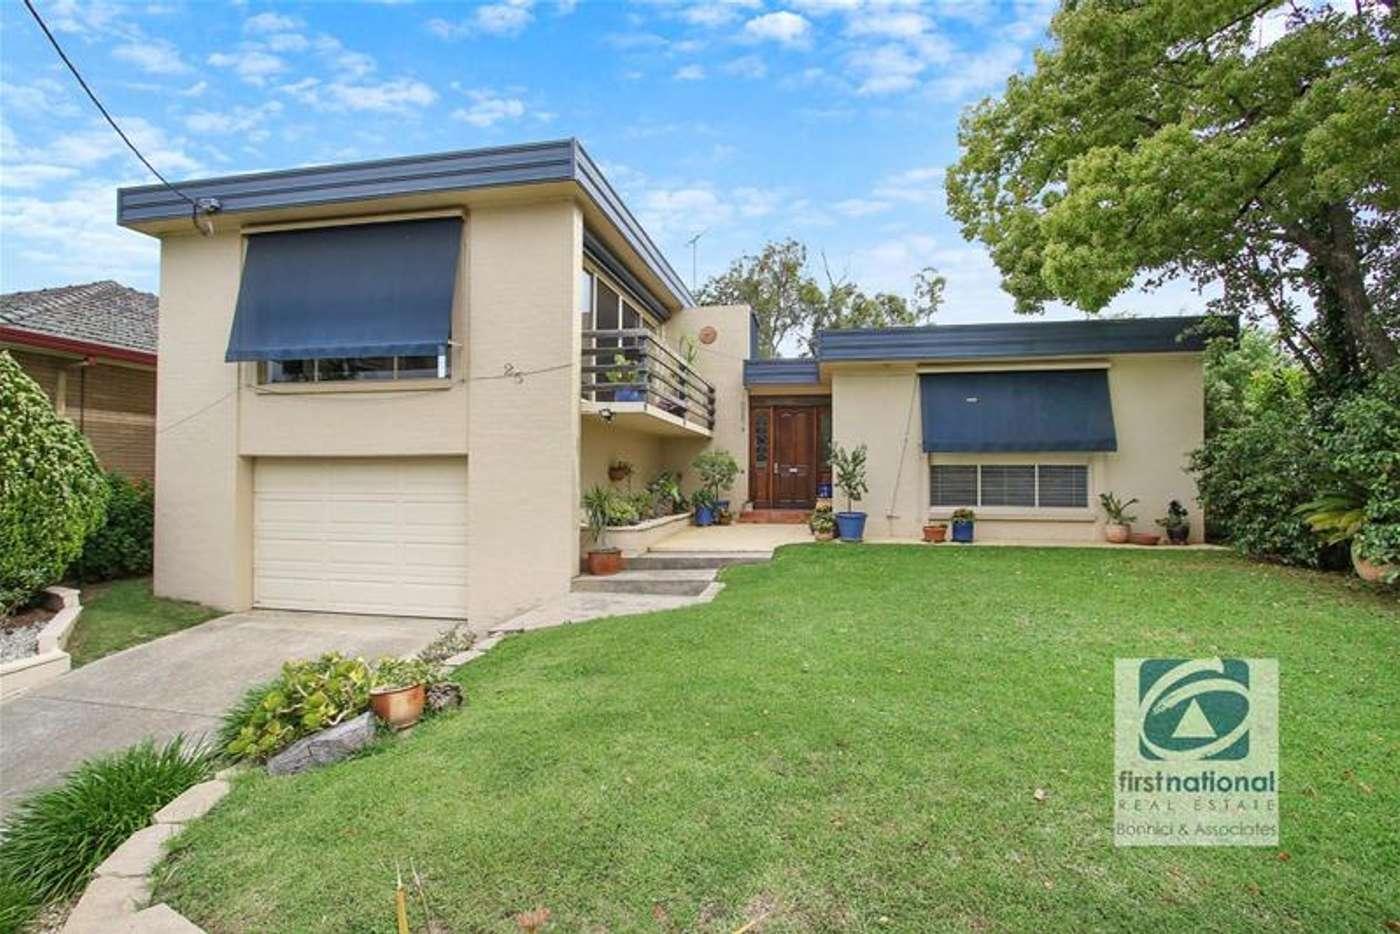 Main view of Homely house listing, 25 Osburn Street, Wodonga VIC 3690